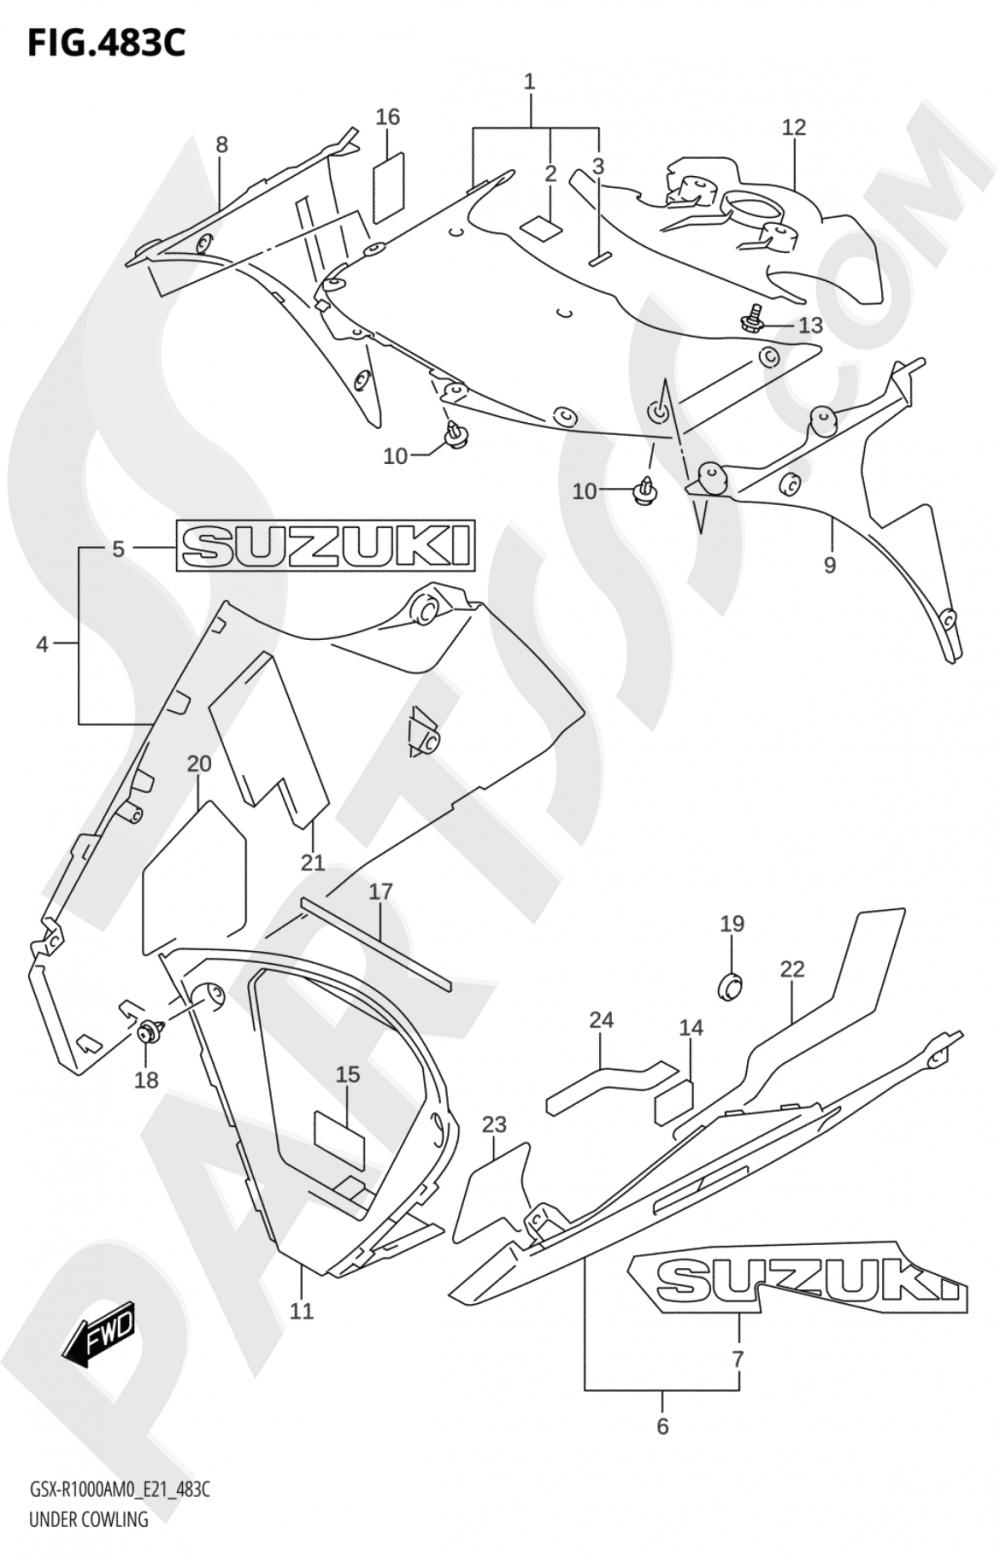 483C - UNDER COWLING (GSX-R1000RA) Suzuki GSX-R1000A 2020